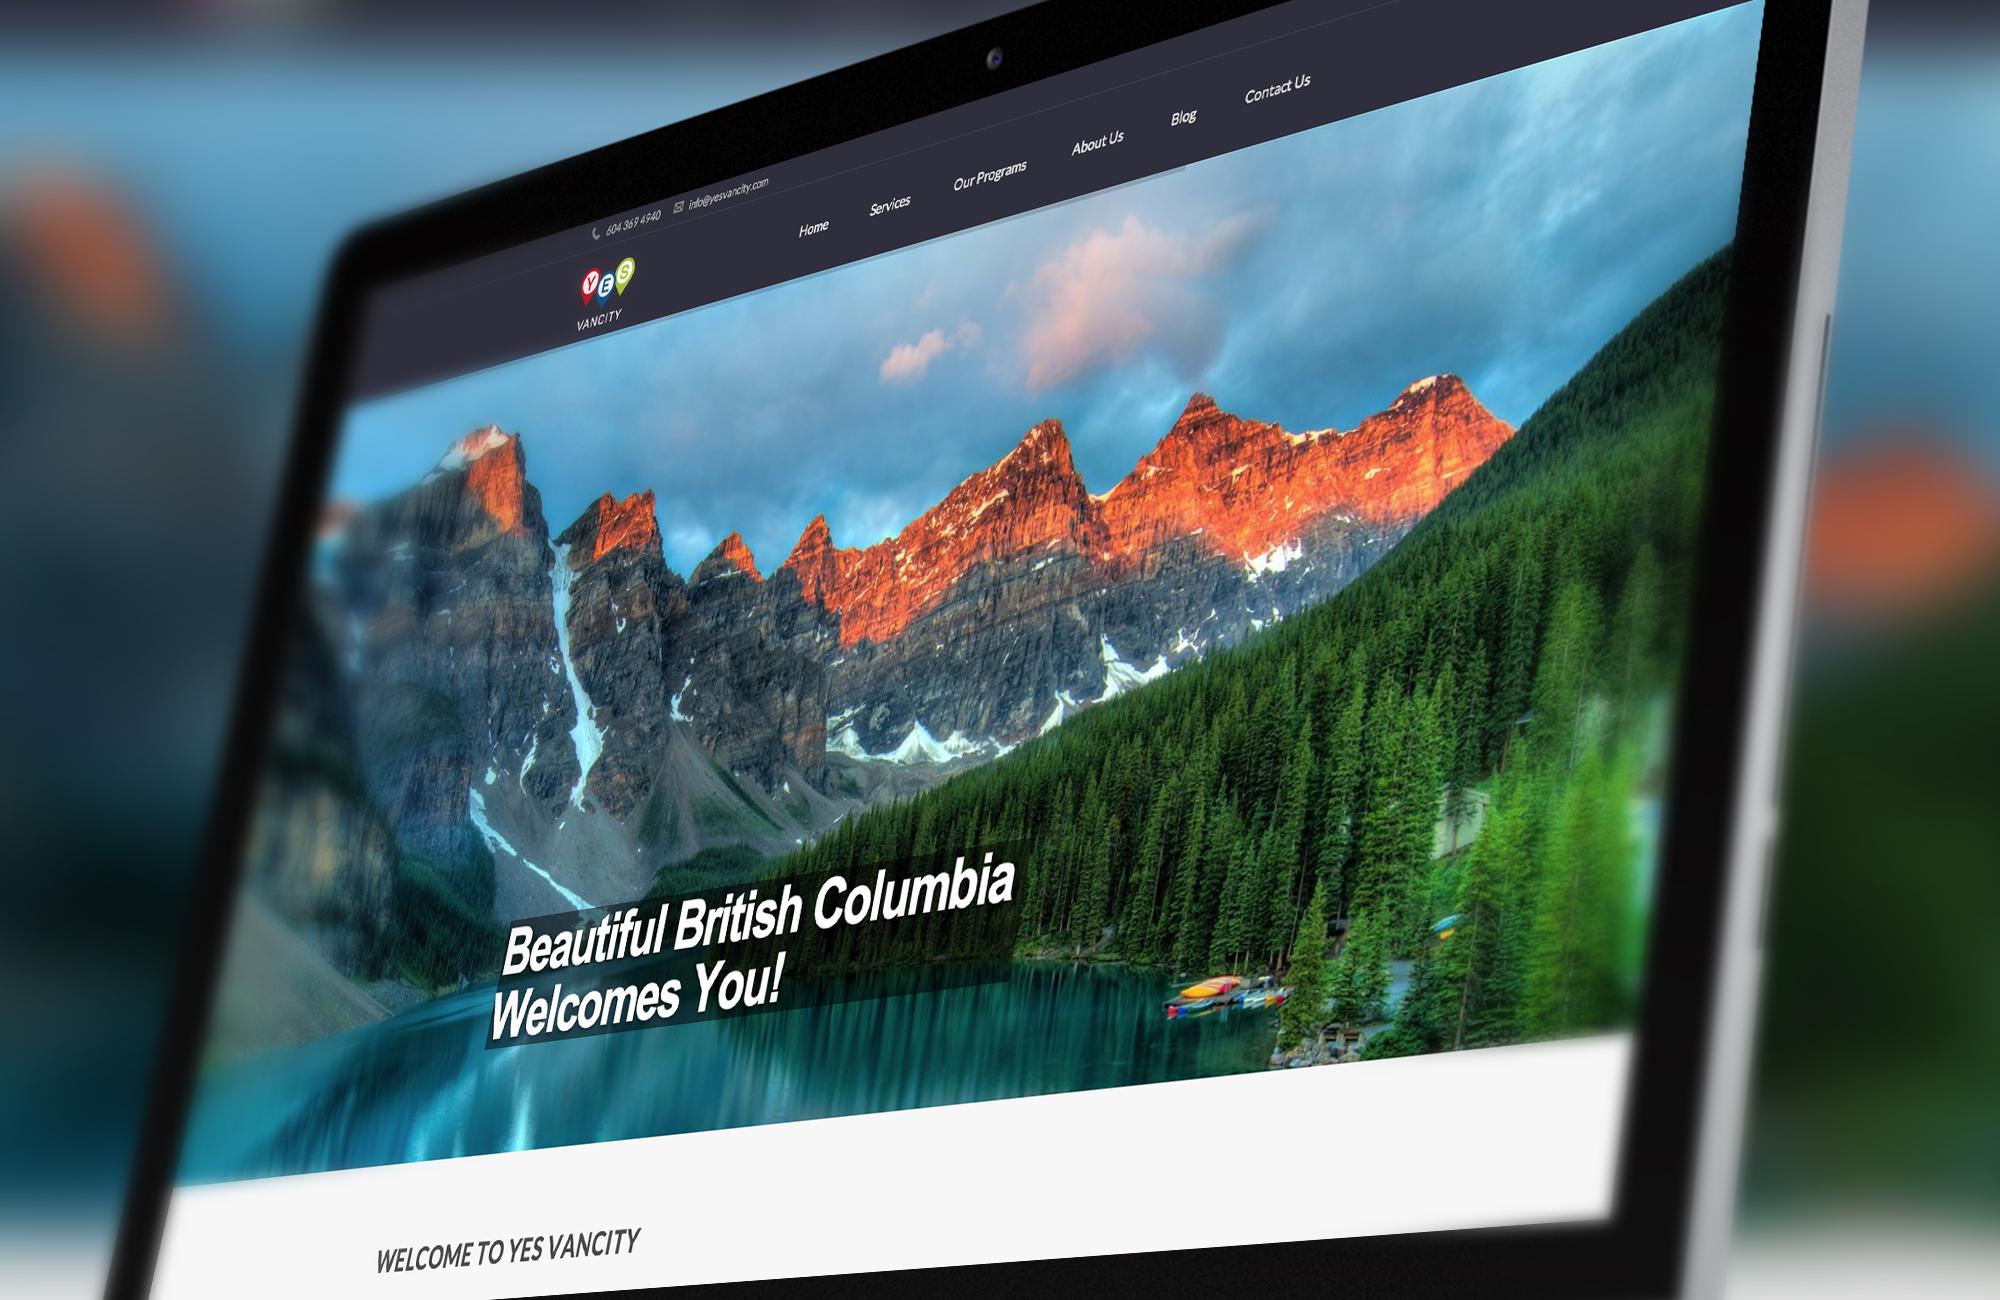 Web Design For Yes Vancity